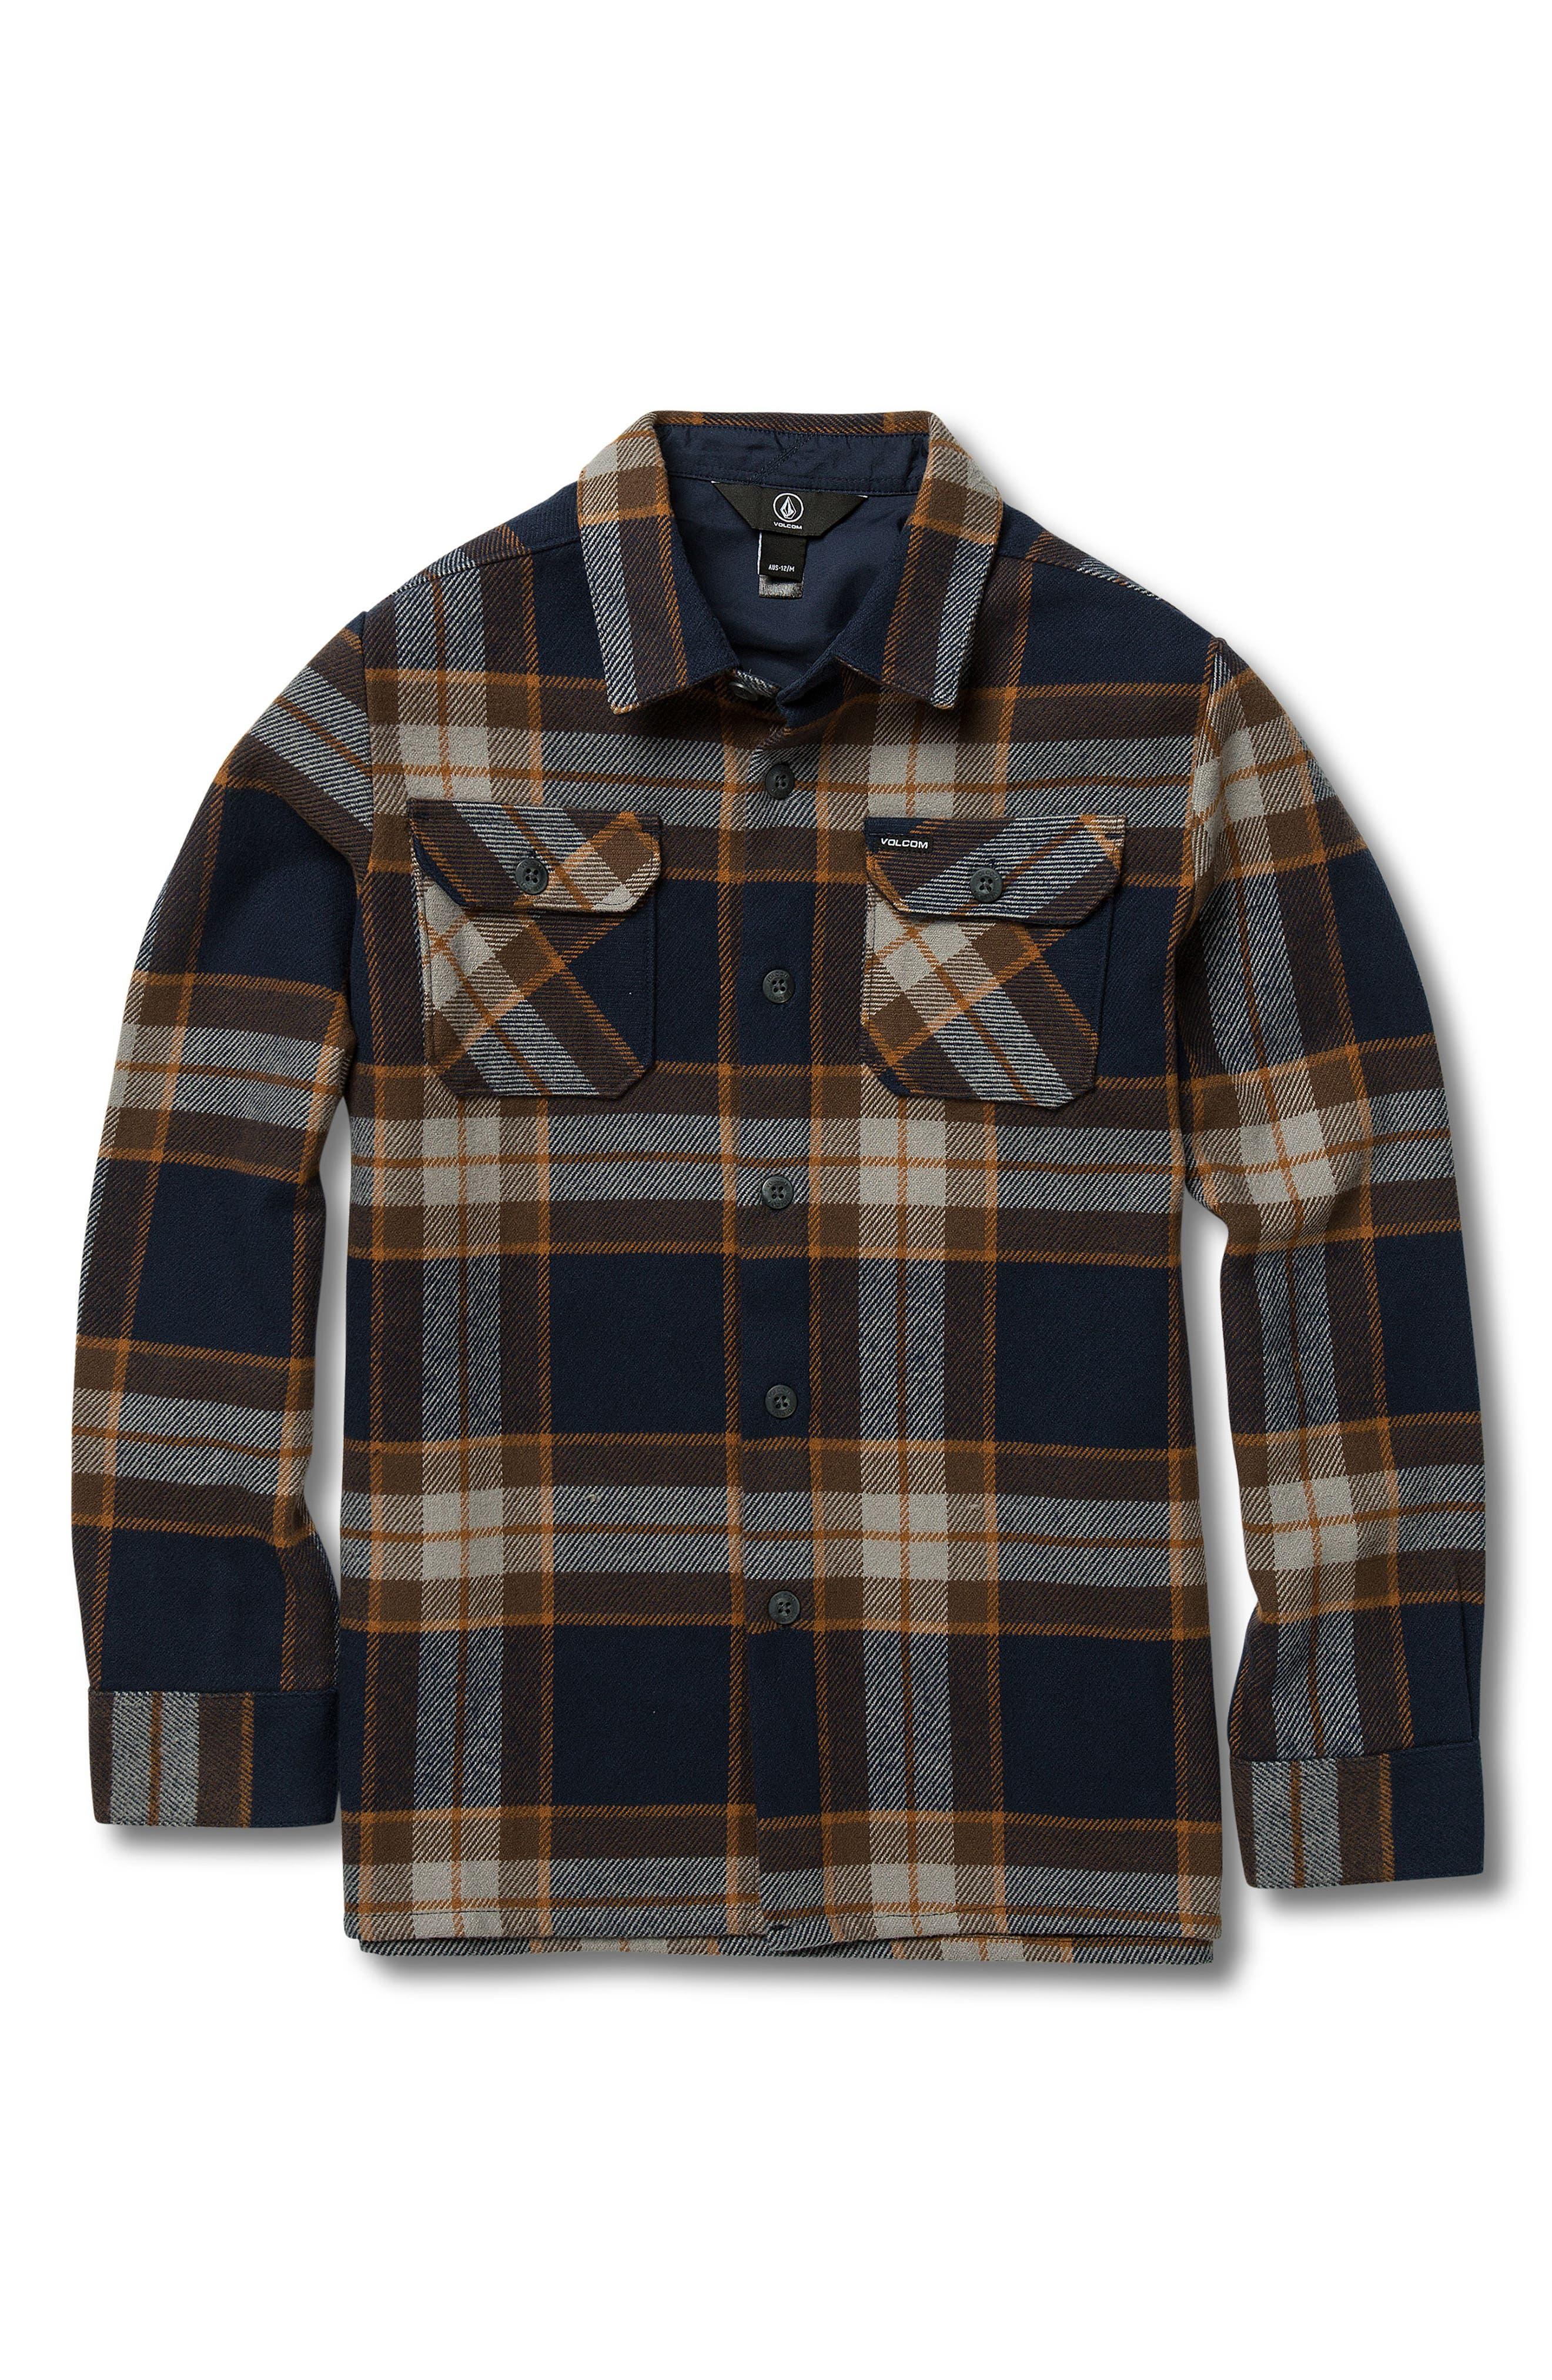 VOLCOM,                             Randower Plaid Flannel Shirt,                             Main thumbnail 1, color,                             MELINDIGO